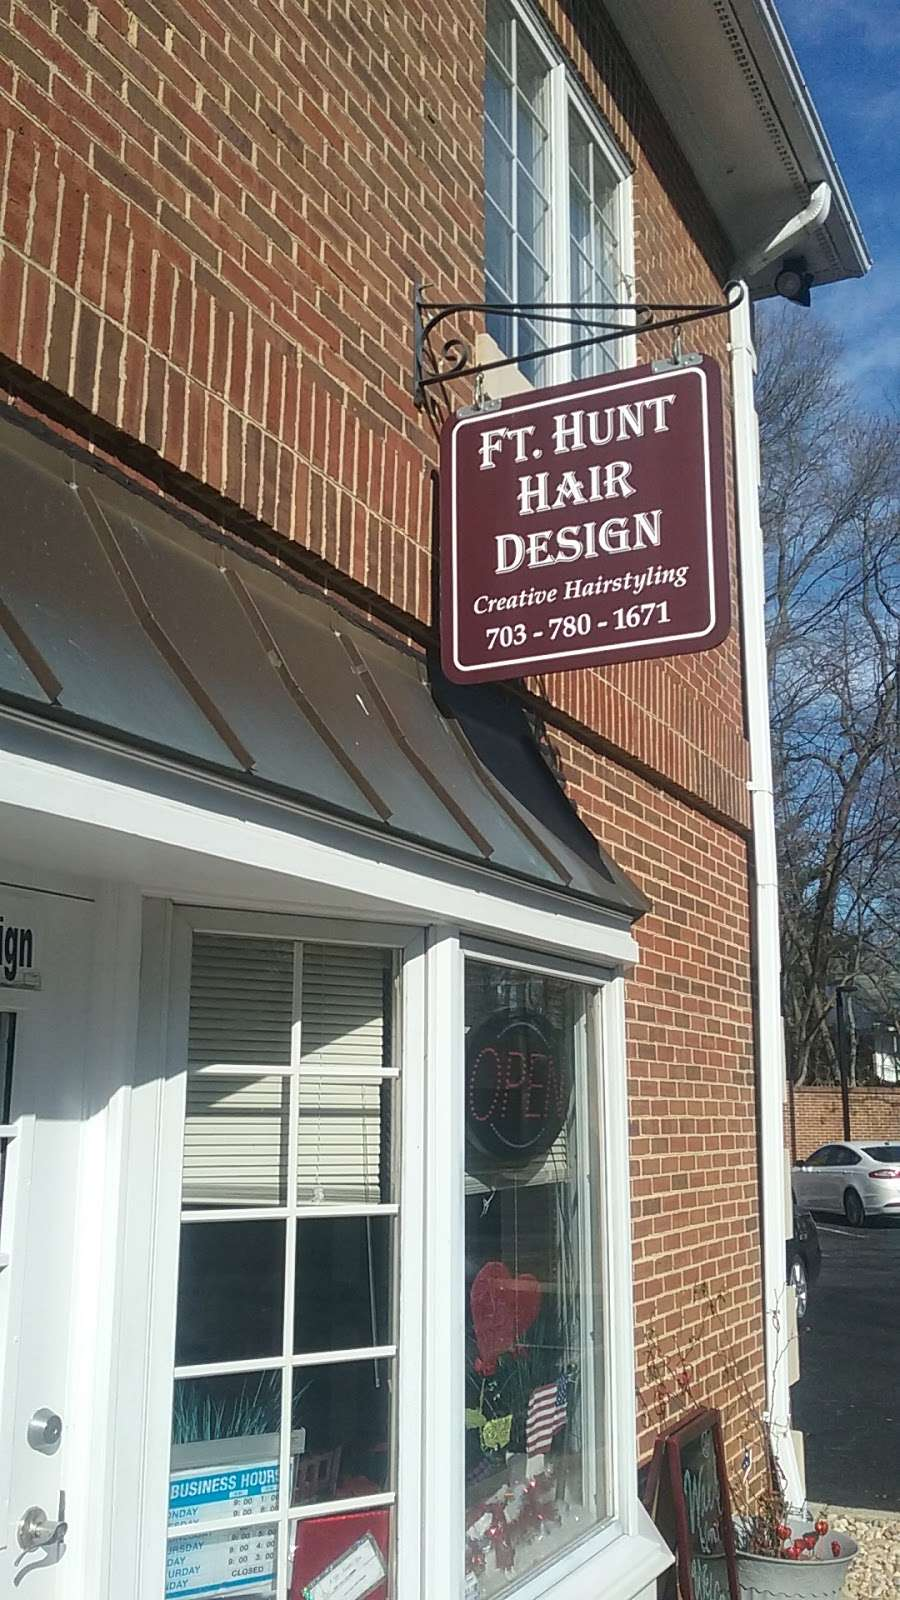 Fort Hunt Hair Design - hair care    Photo 2 of 8   Address: 2406, 1900 Elkin St # 1, Alexandria, VA 22308, USA   Phone: (703) 780-1671